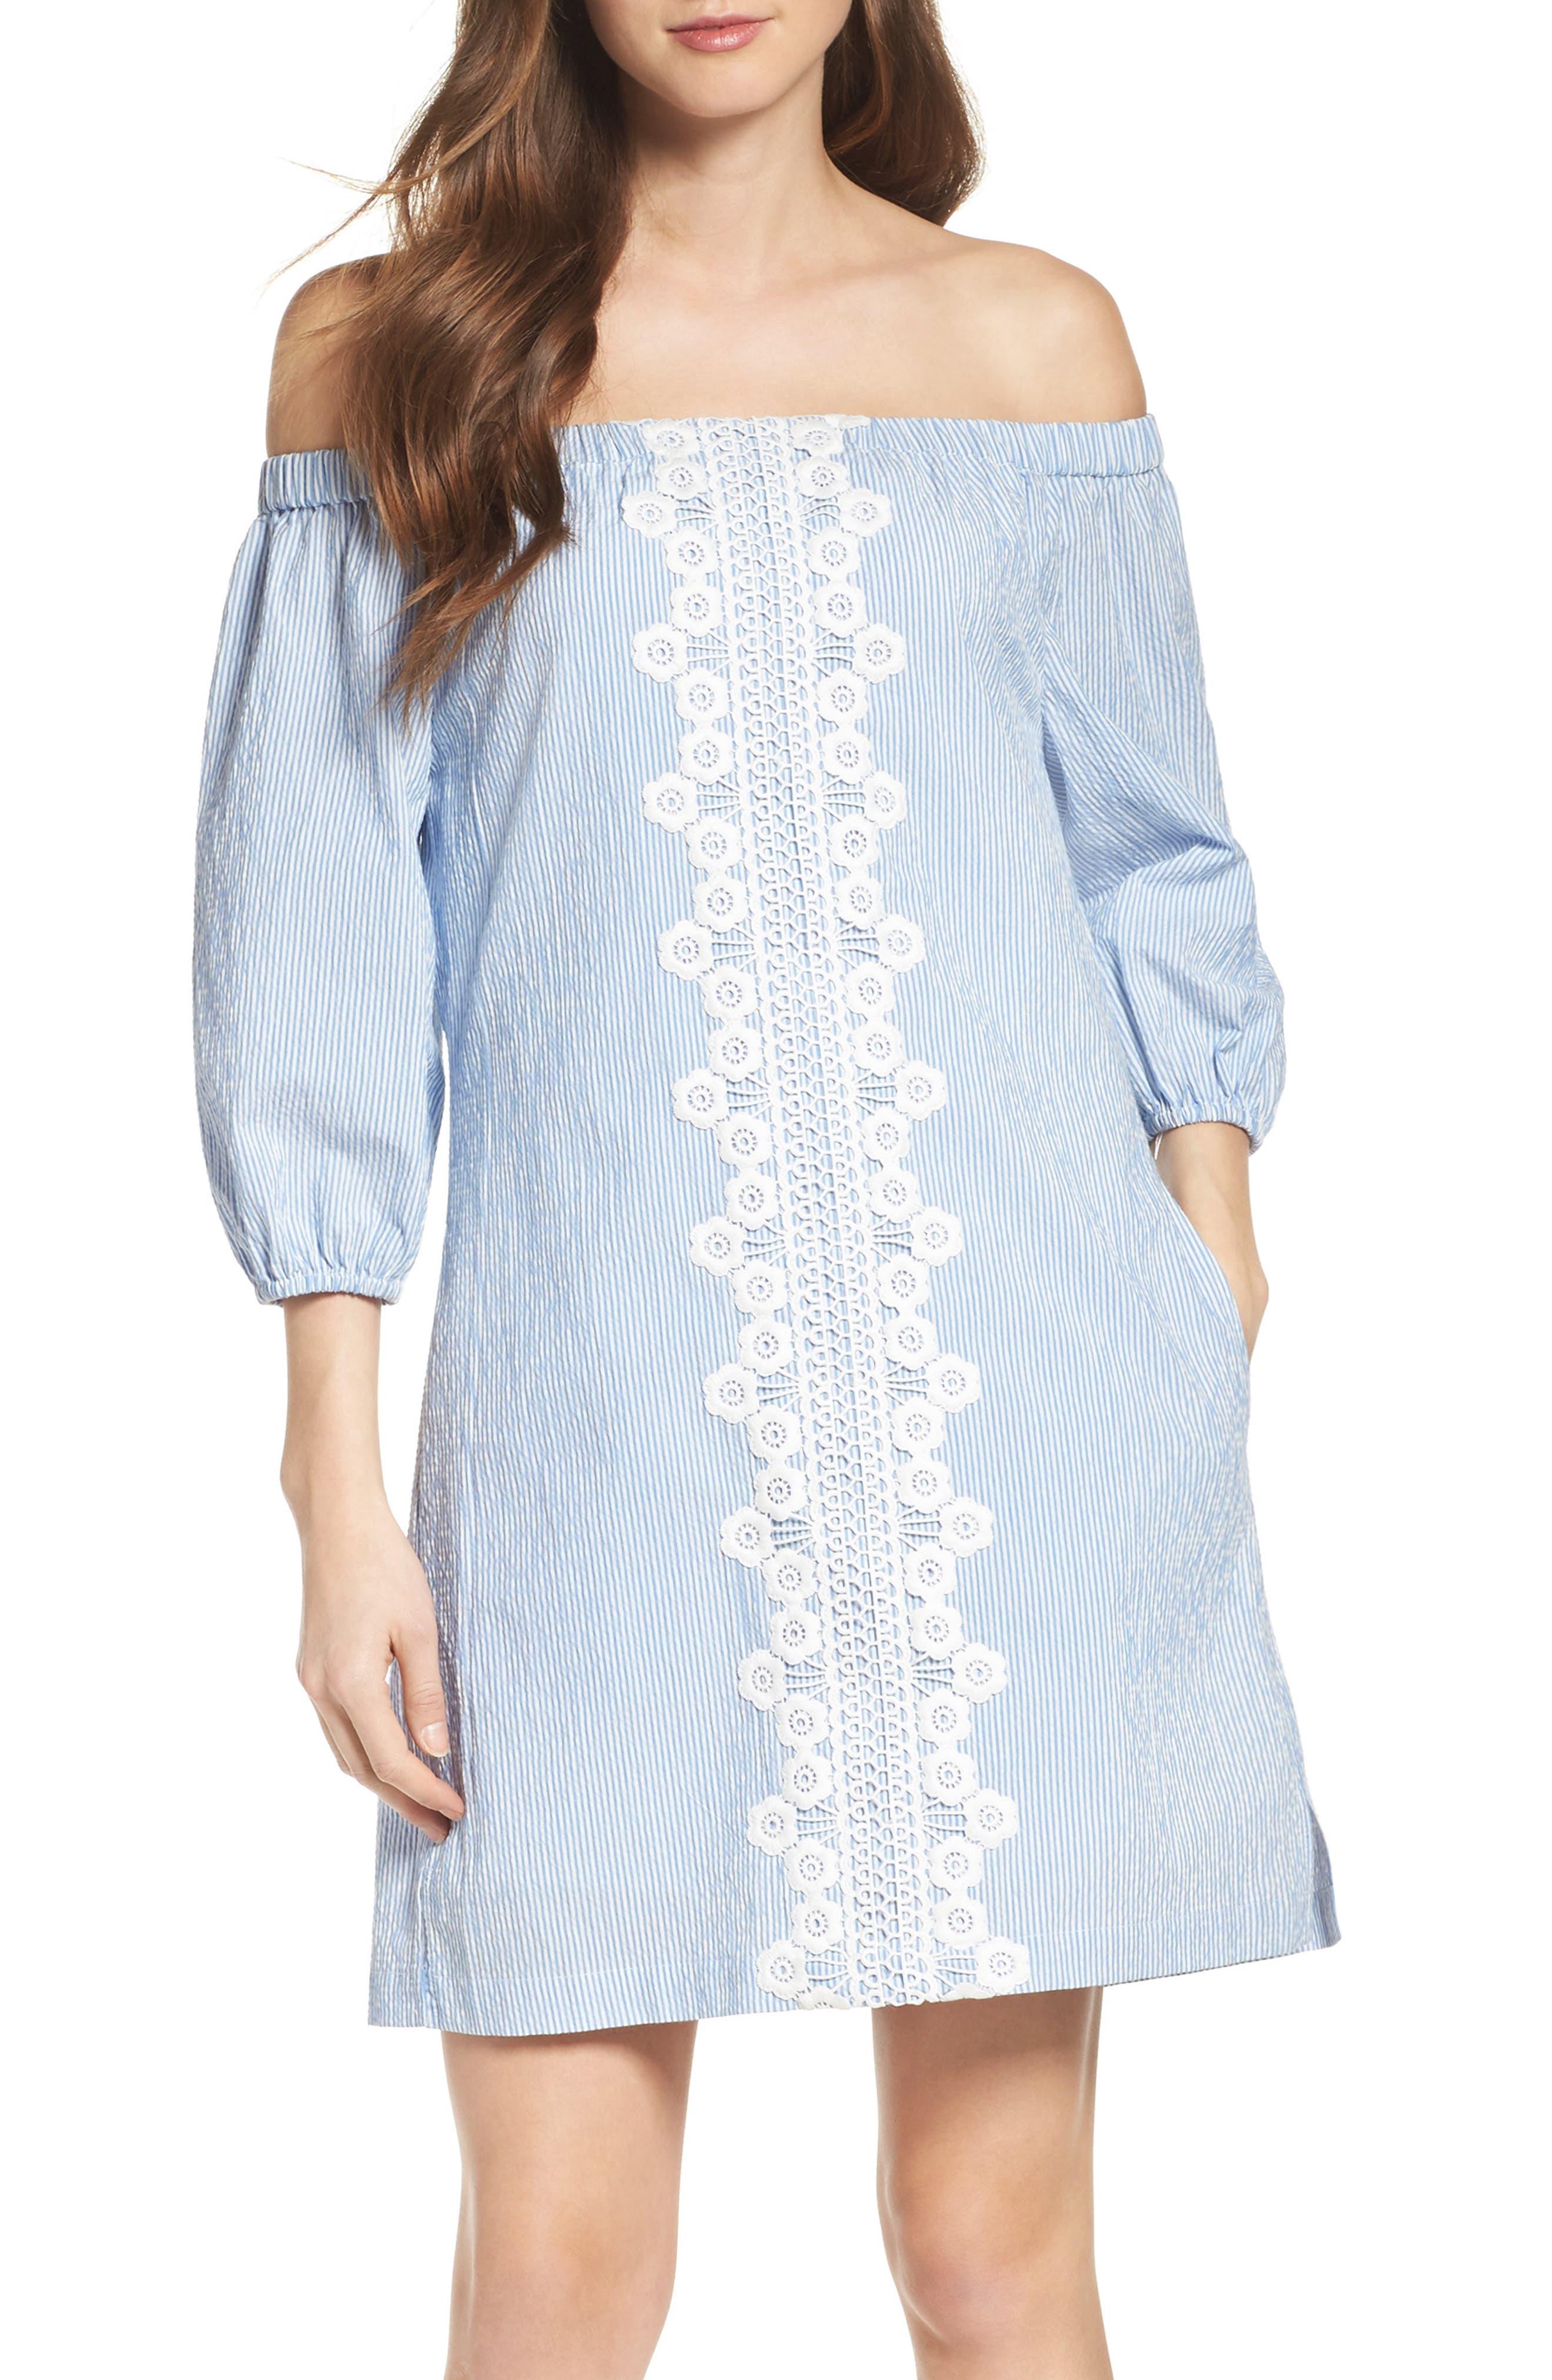 Alternate Image 1 Selected - Eliza J Lace Trim Seersucker Off the Shoulder Dress (Regular & Petite)